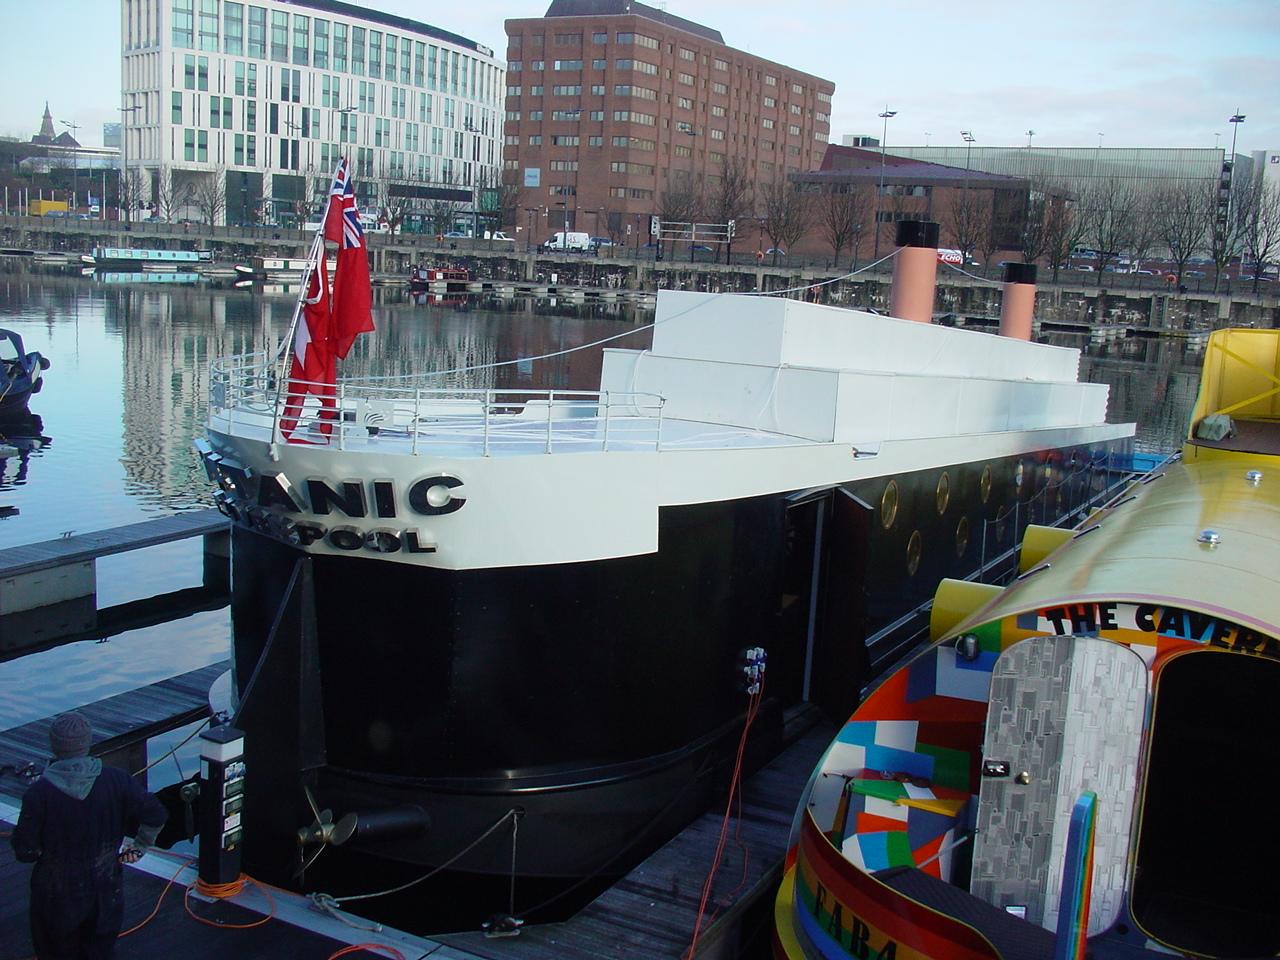 Titanic_Liverpool_hotel2